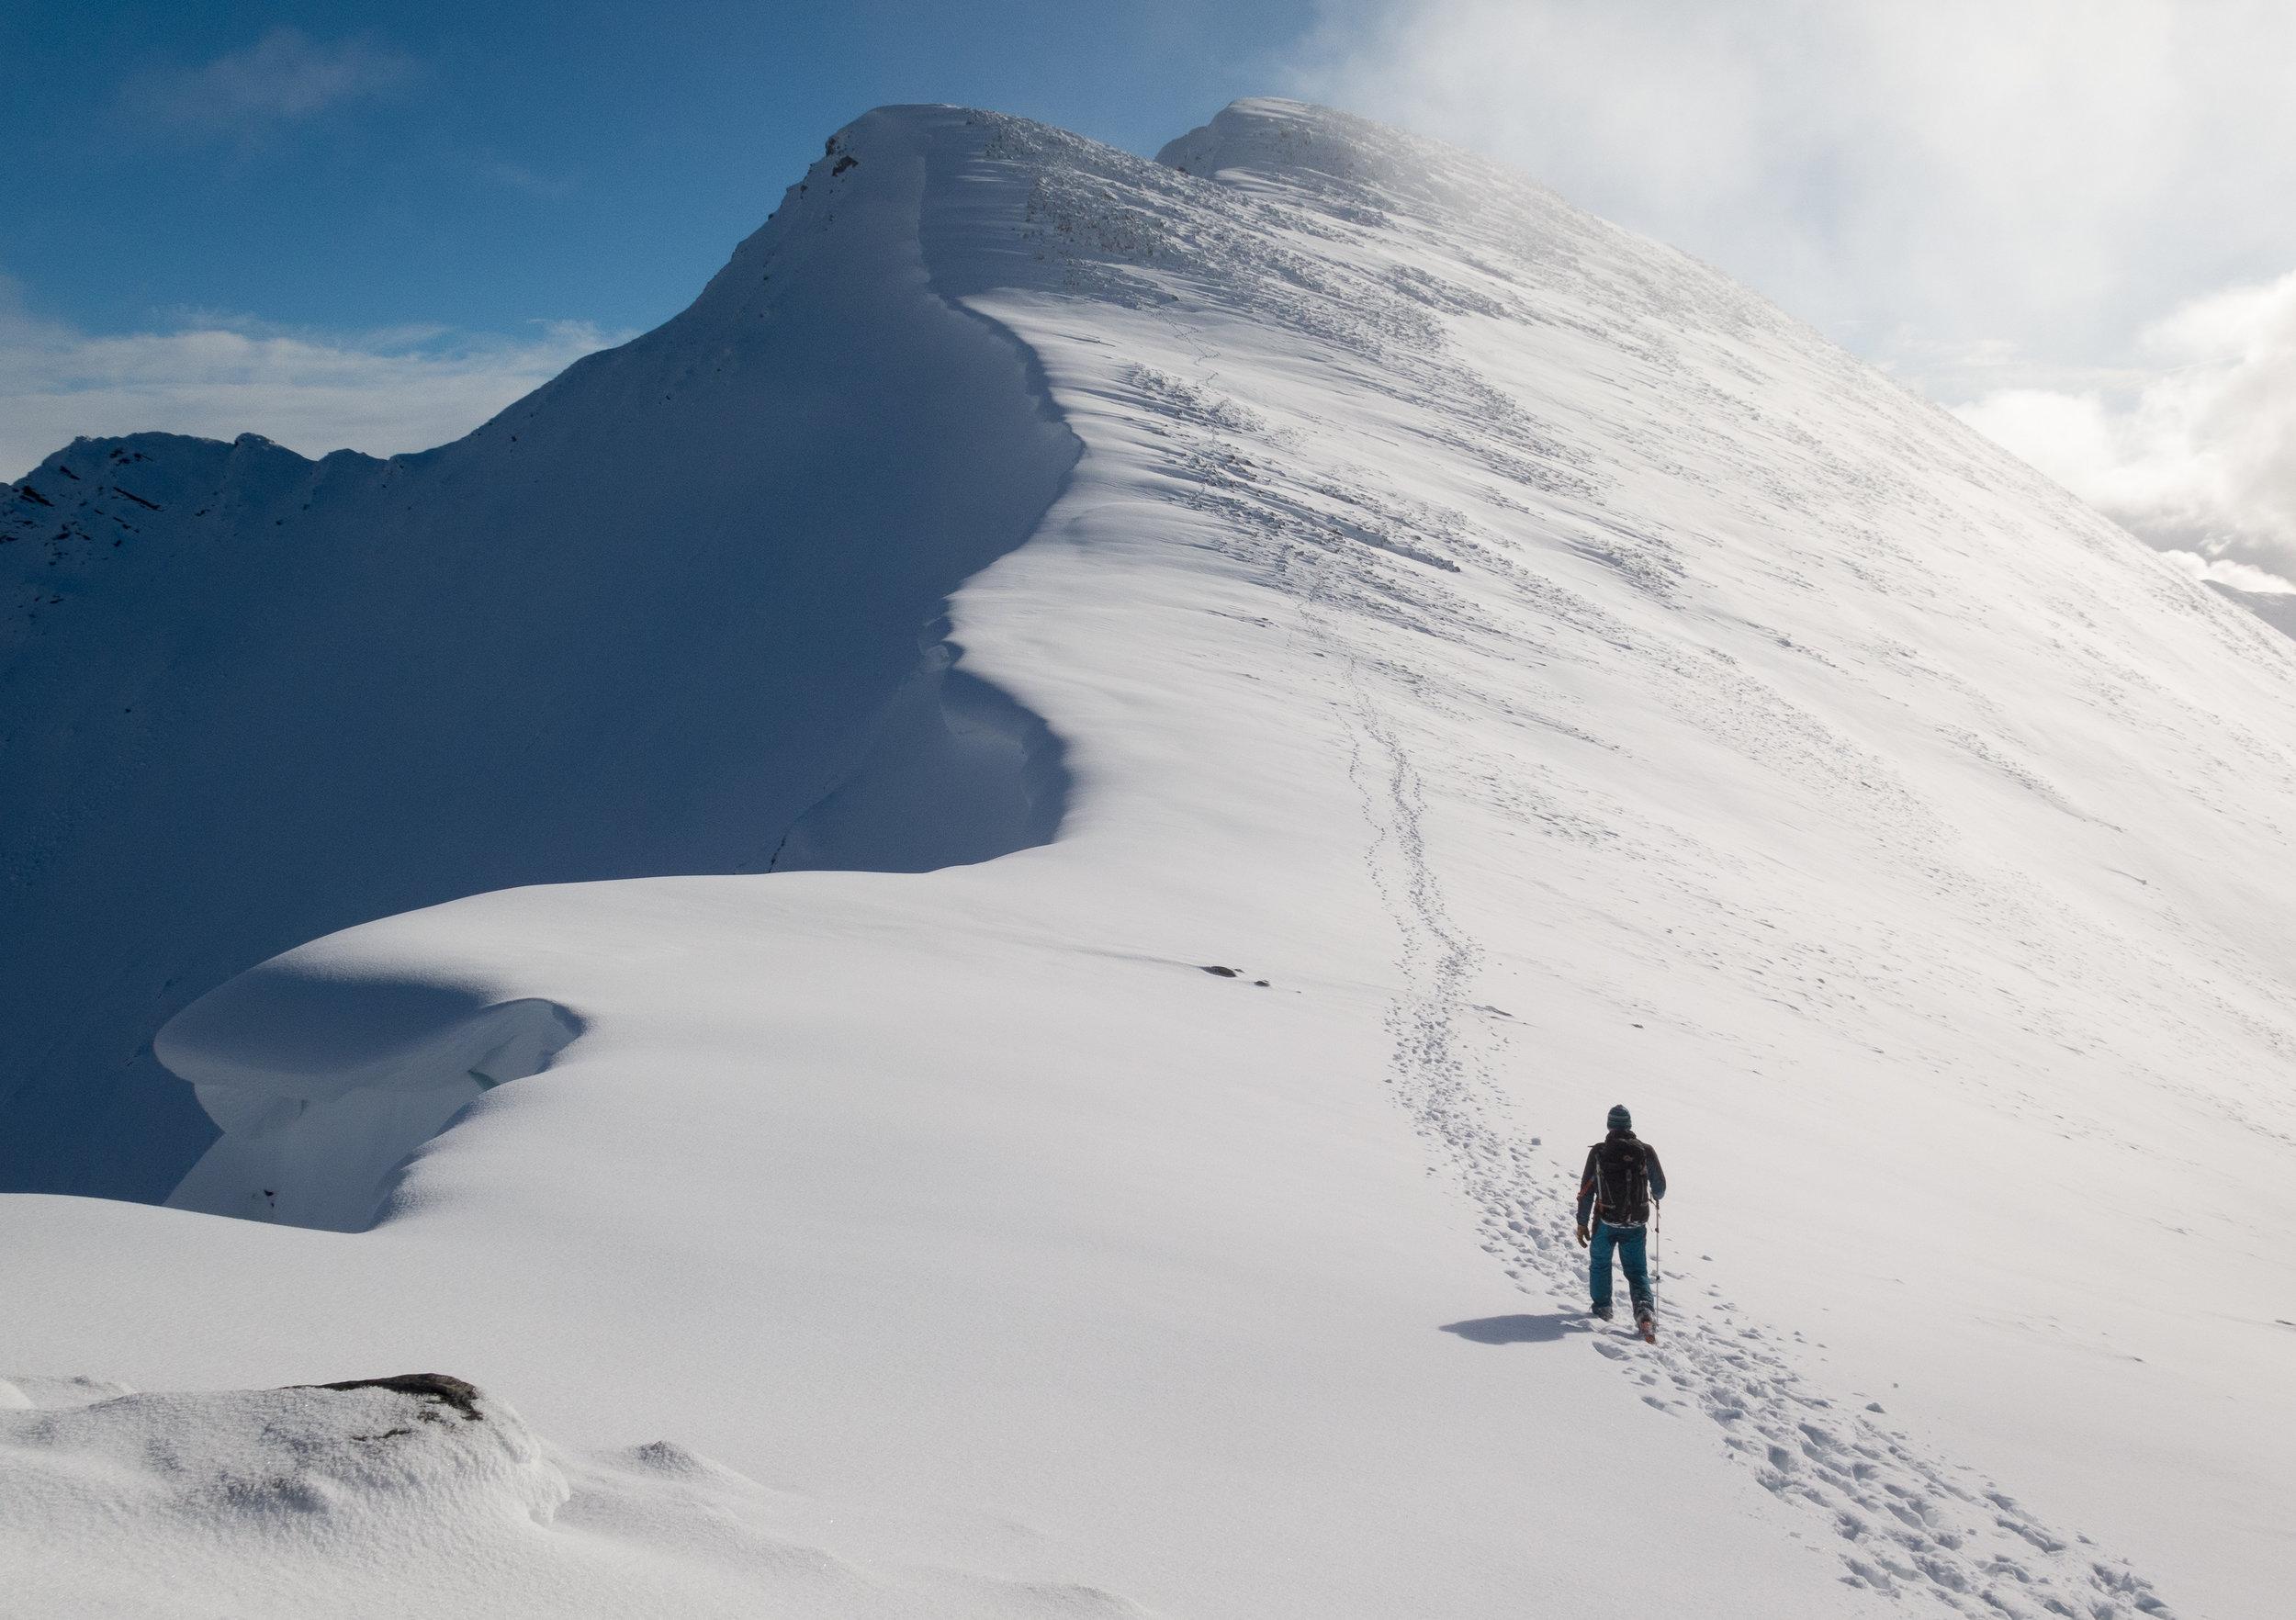 The North Ridge of Stob Ban under heavy snow. Photo credit: Rory Shaw, Snowdonia Mountaineering